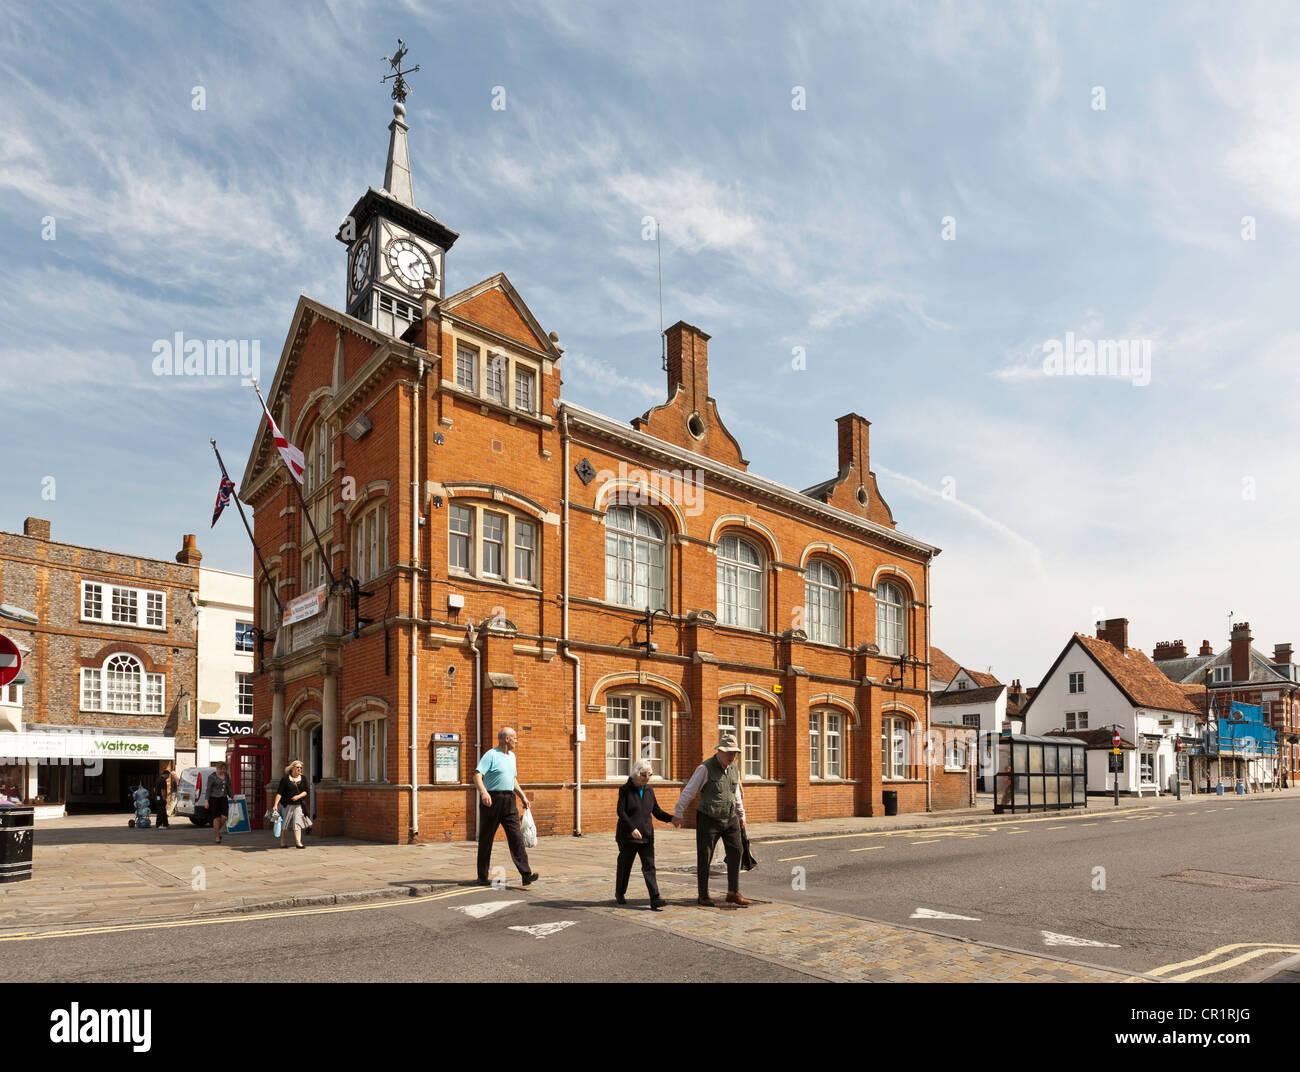 Town Hall, Thame, Oxfordshire, England - Stock Image